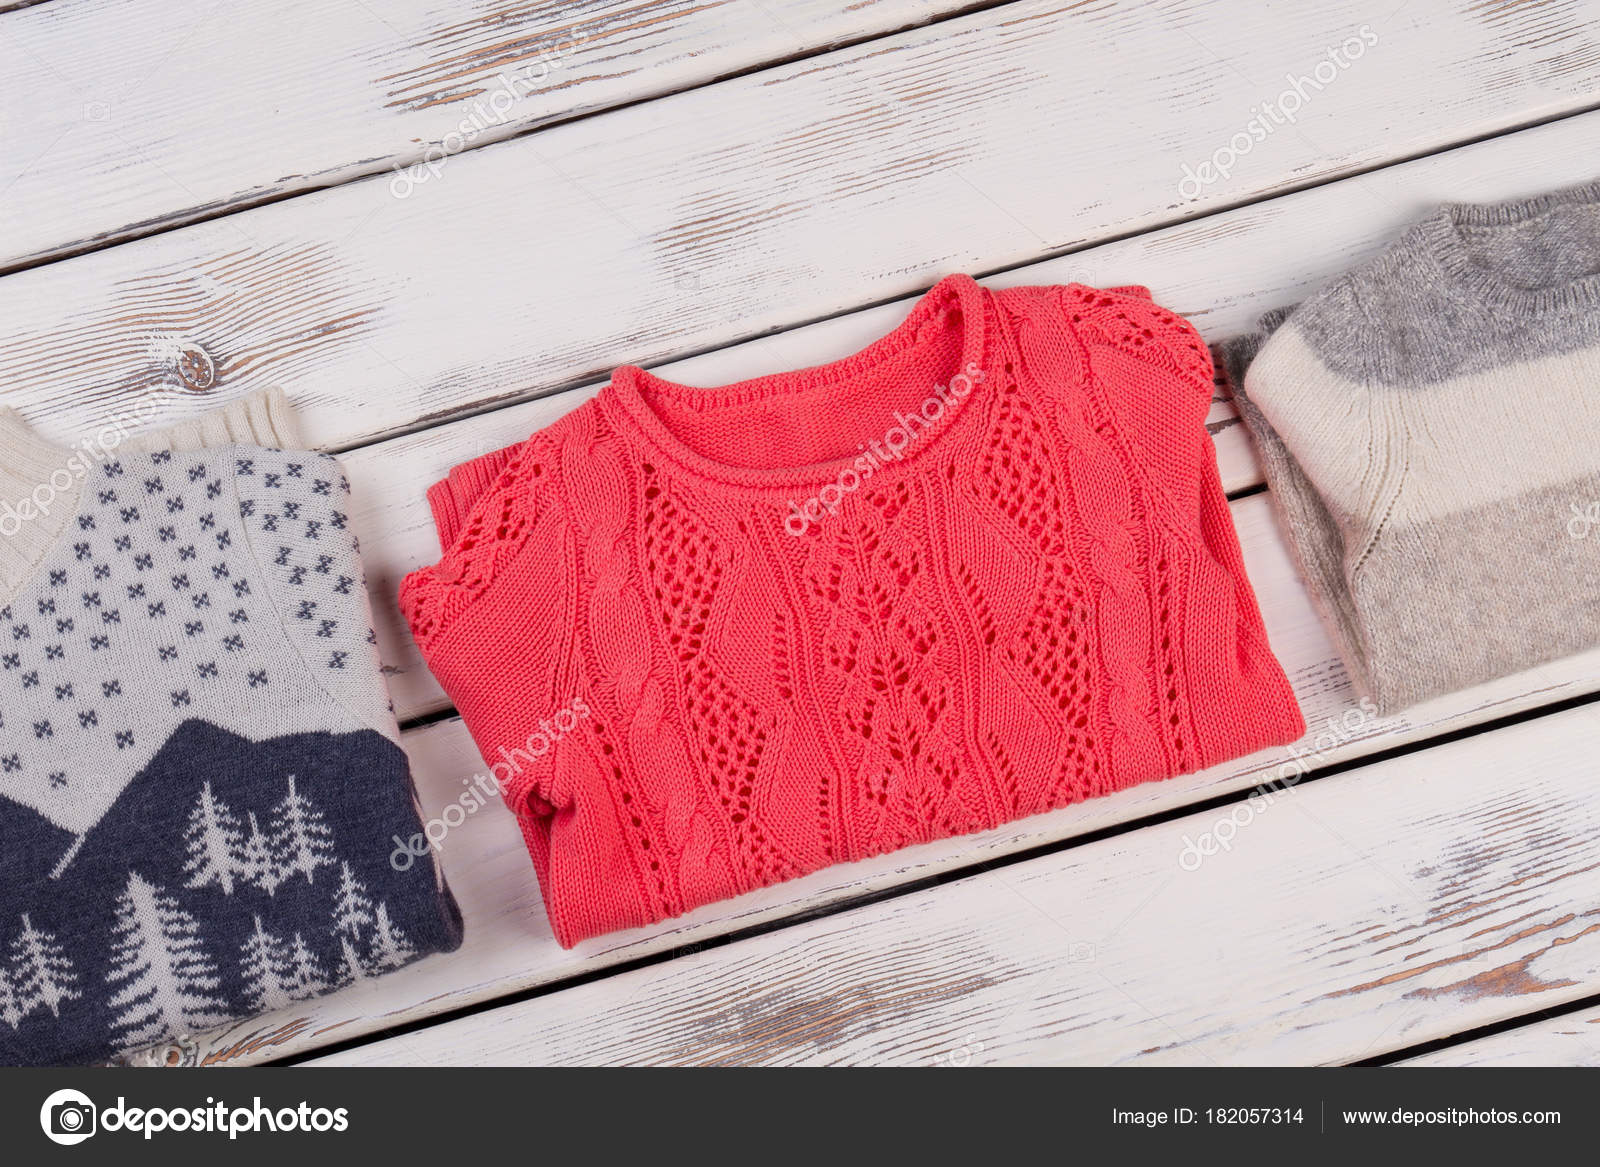 Ručně pletené a háčkované svetry — Stock Fotografie © margostock ... 4170b2d74a